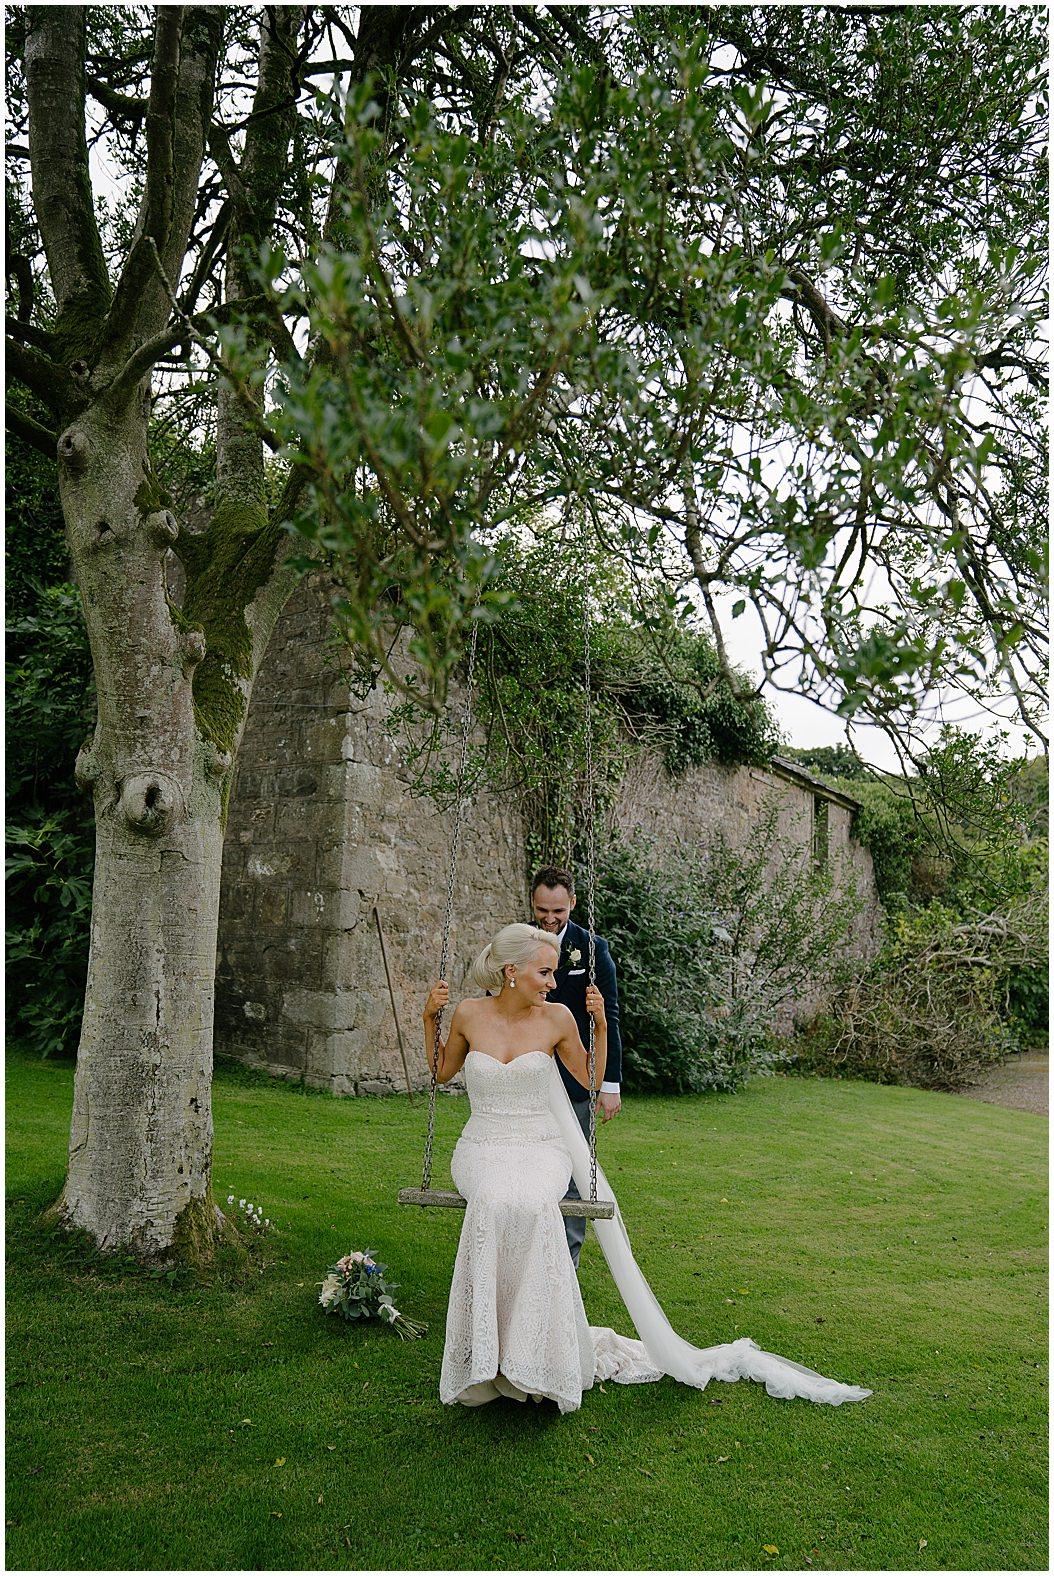 tempo-manor-wedding-jude-browne-photography_0114.jpg